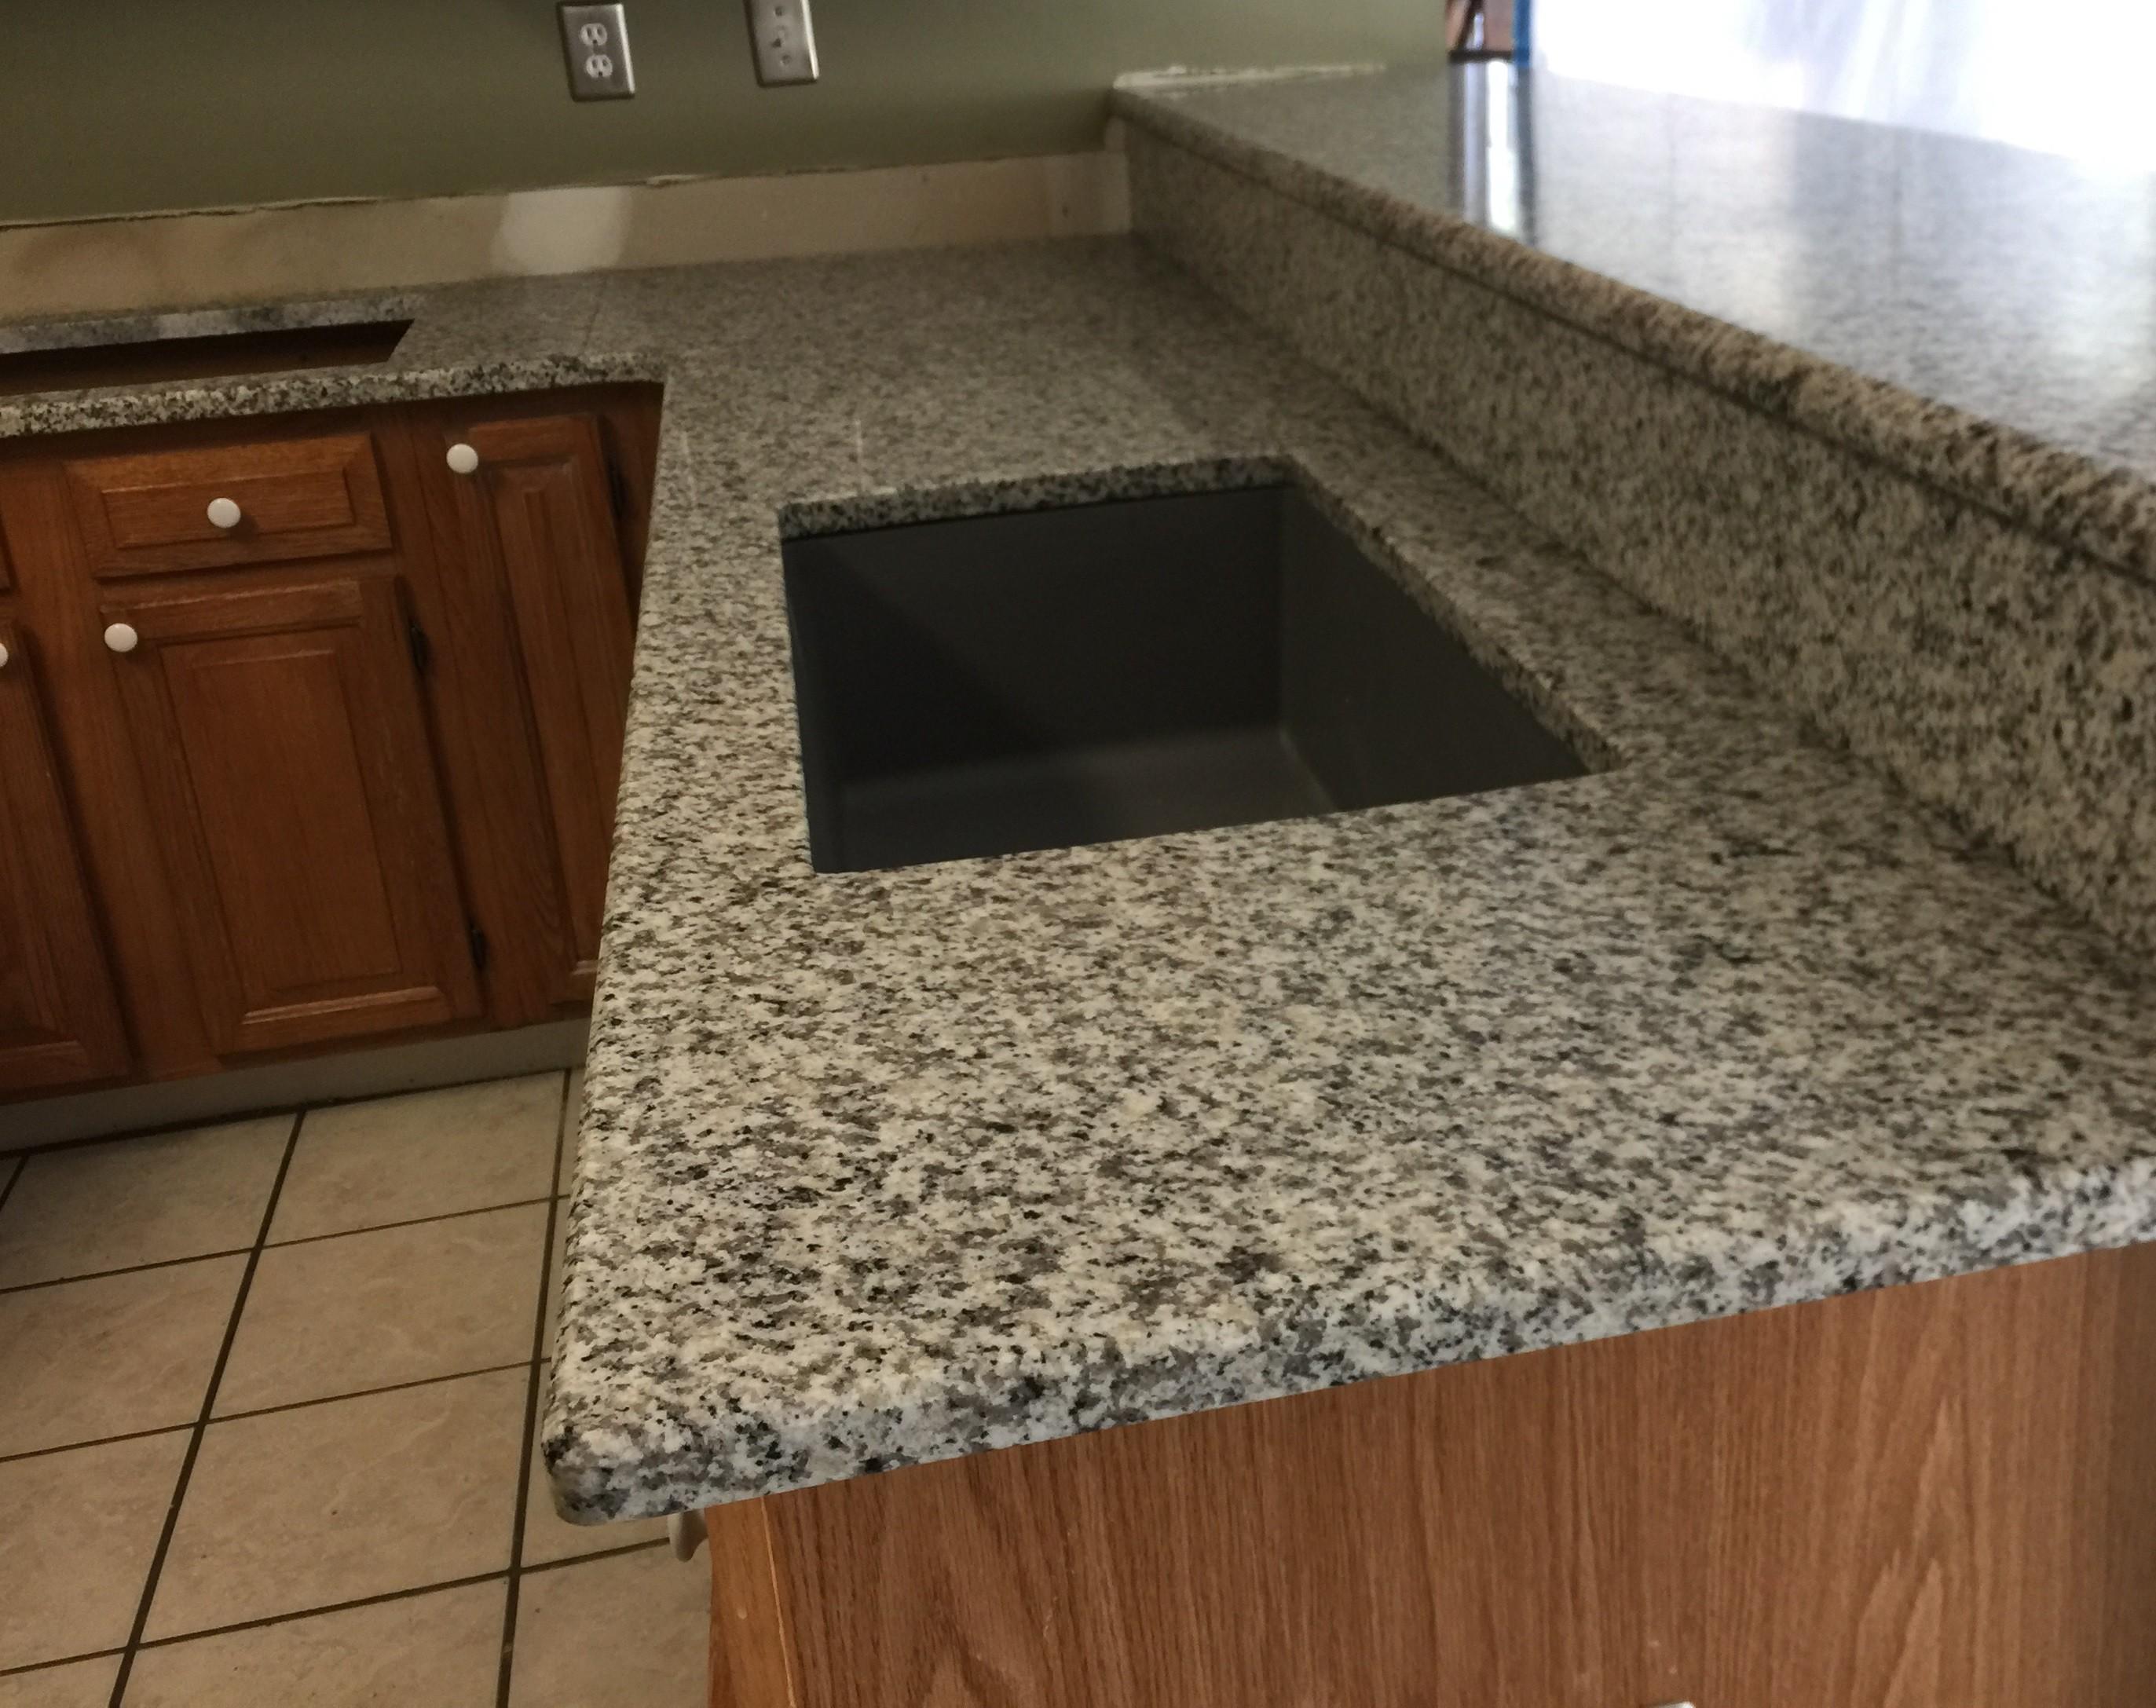 Bella White kitchen countertop